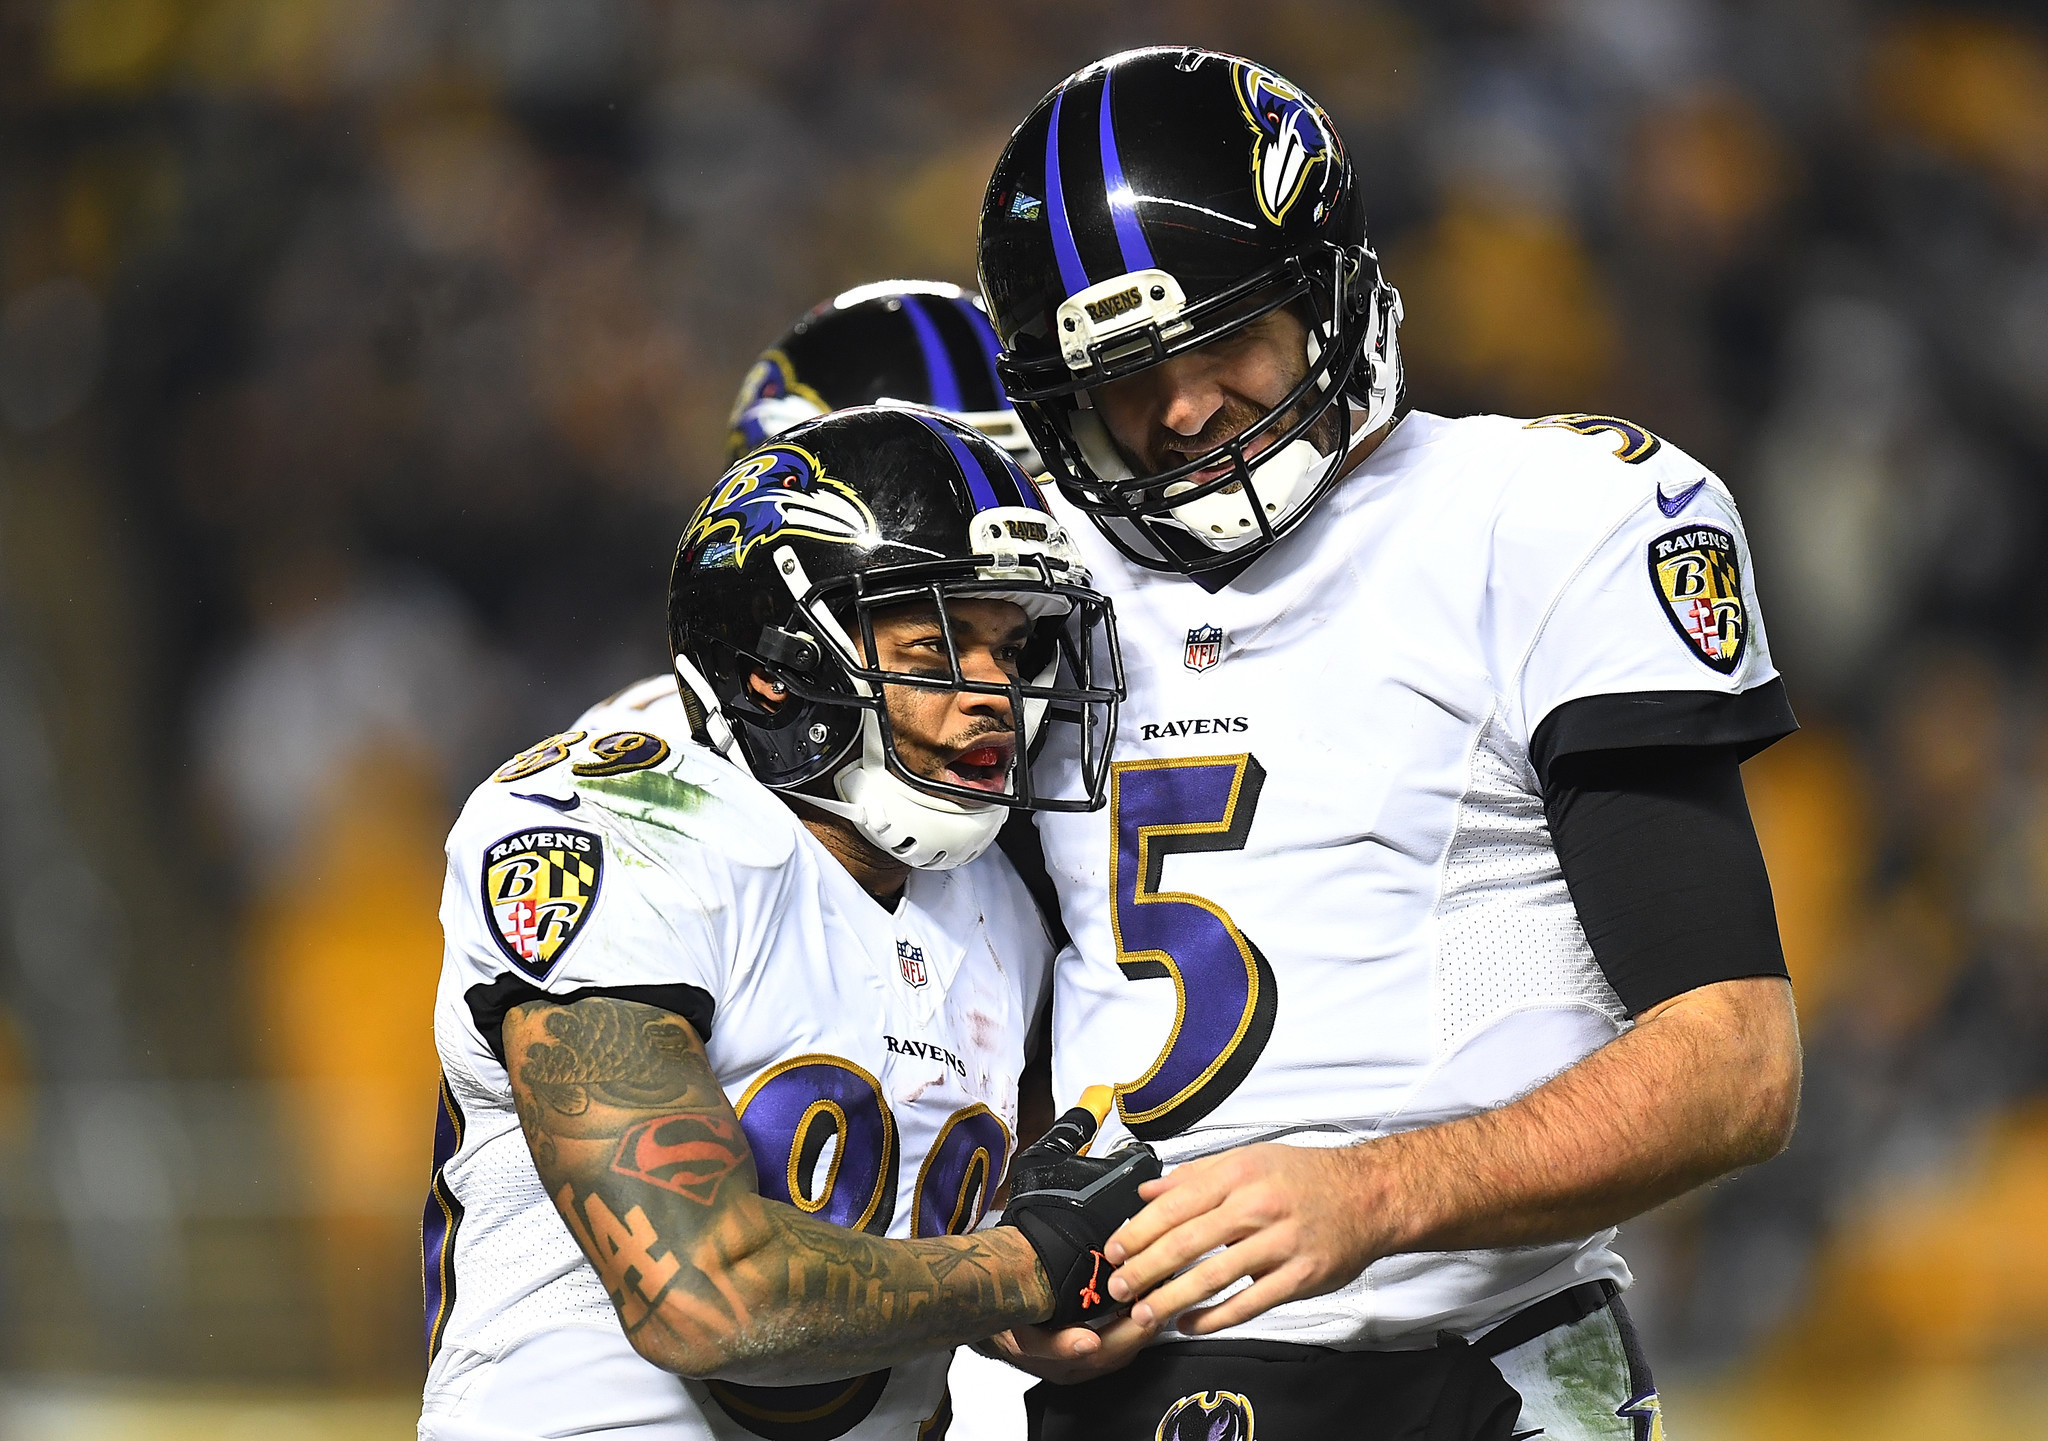 Bal-we-let-joe-down-steve-smith-sr-defends-flacco-says-ravens-qb-wasn-t-fully-healthy-20170111